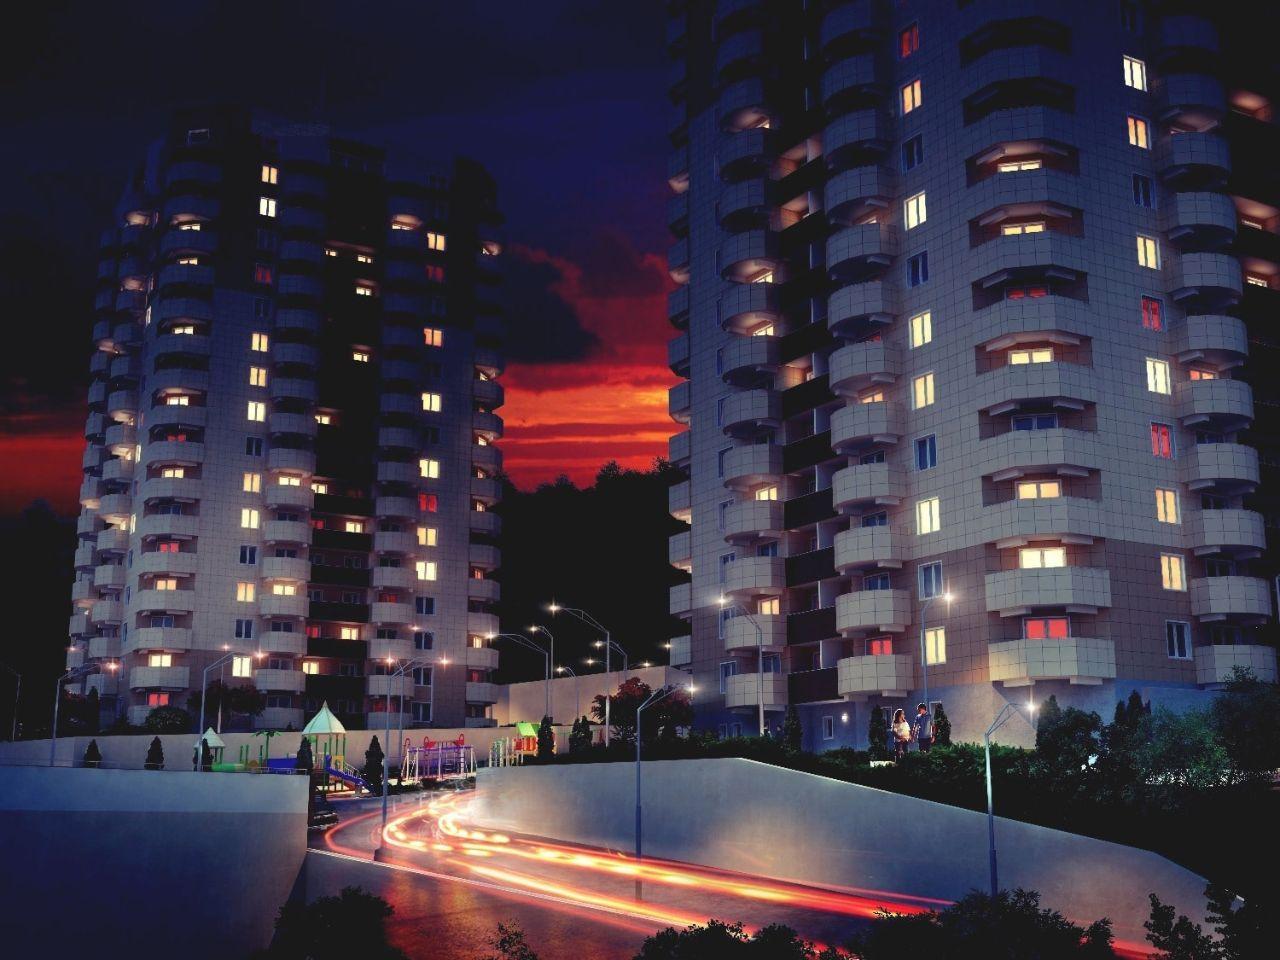 купить квартиру в ЖК Варяг-центр